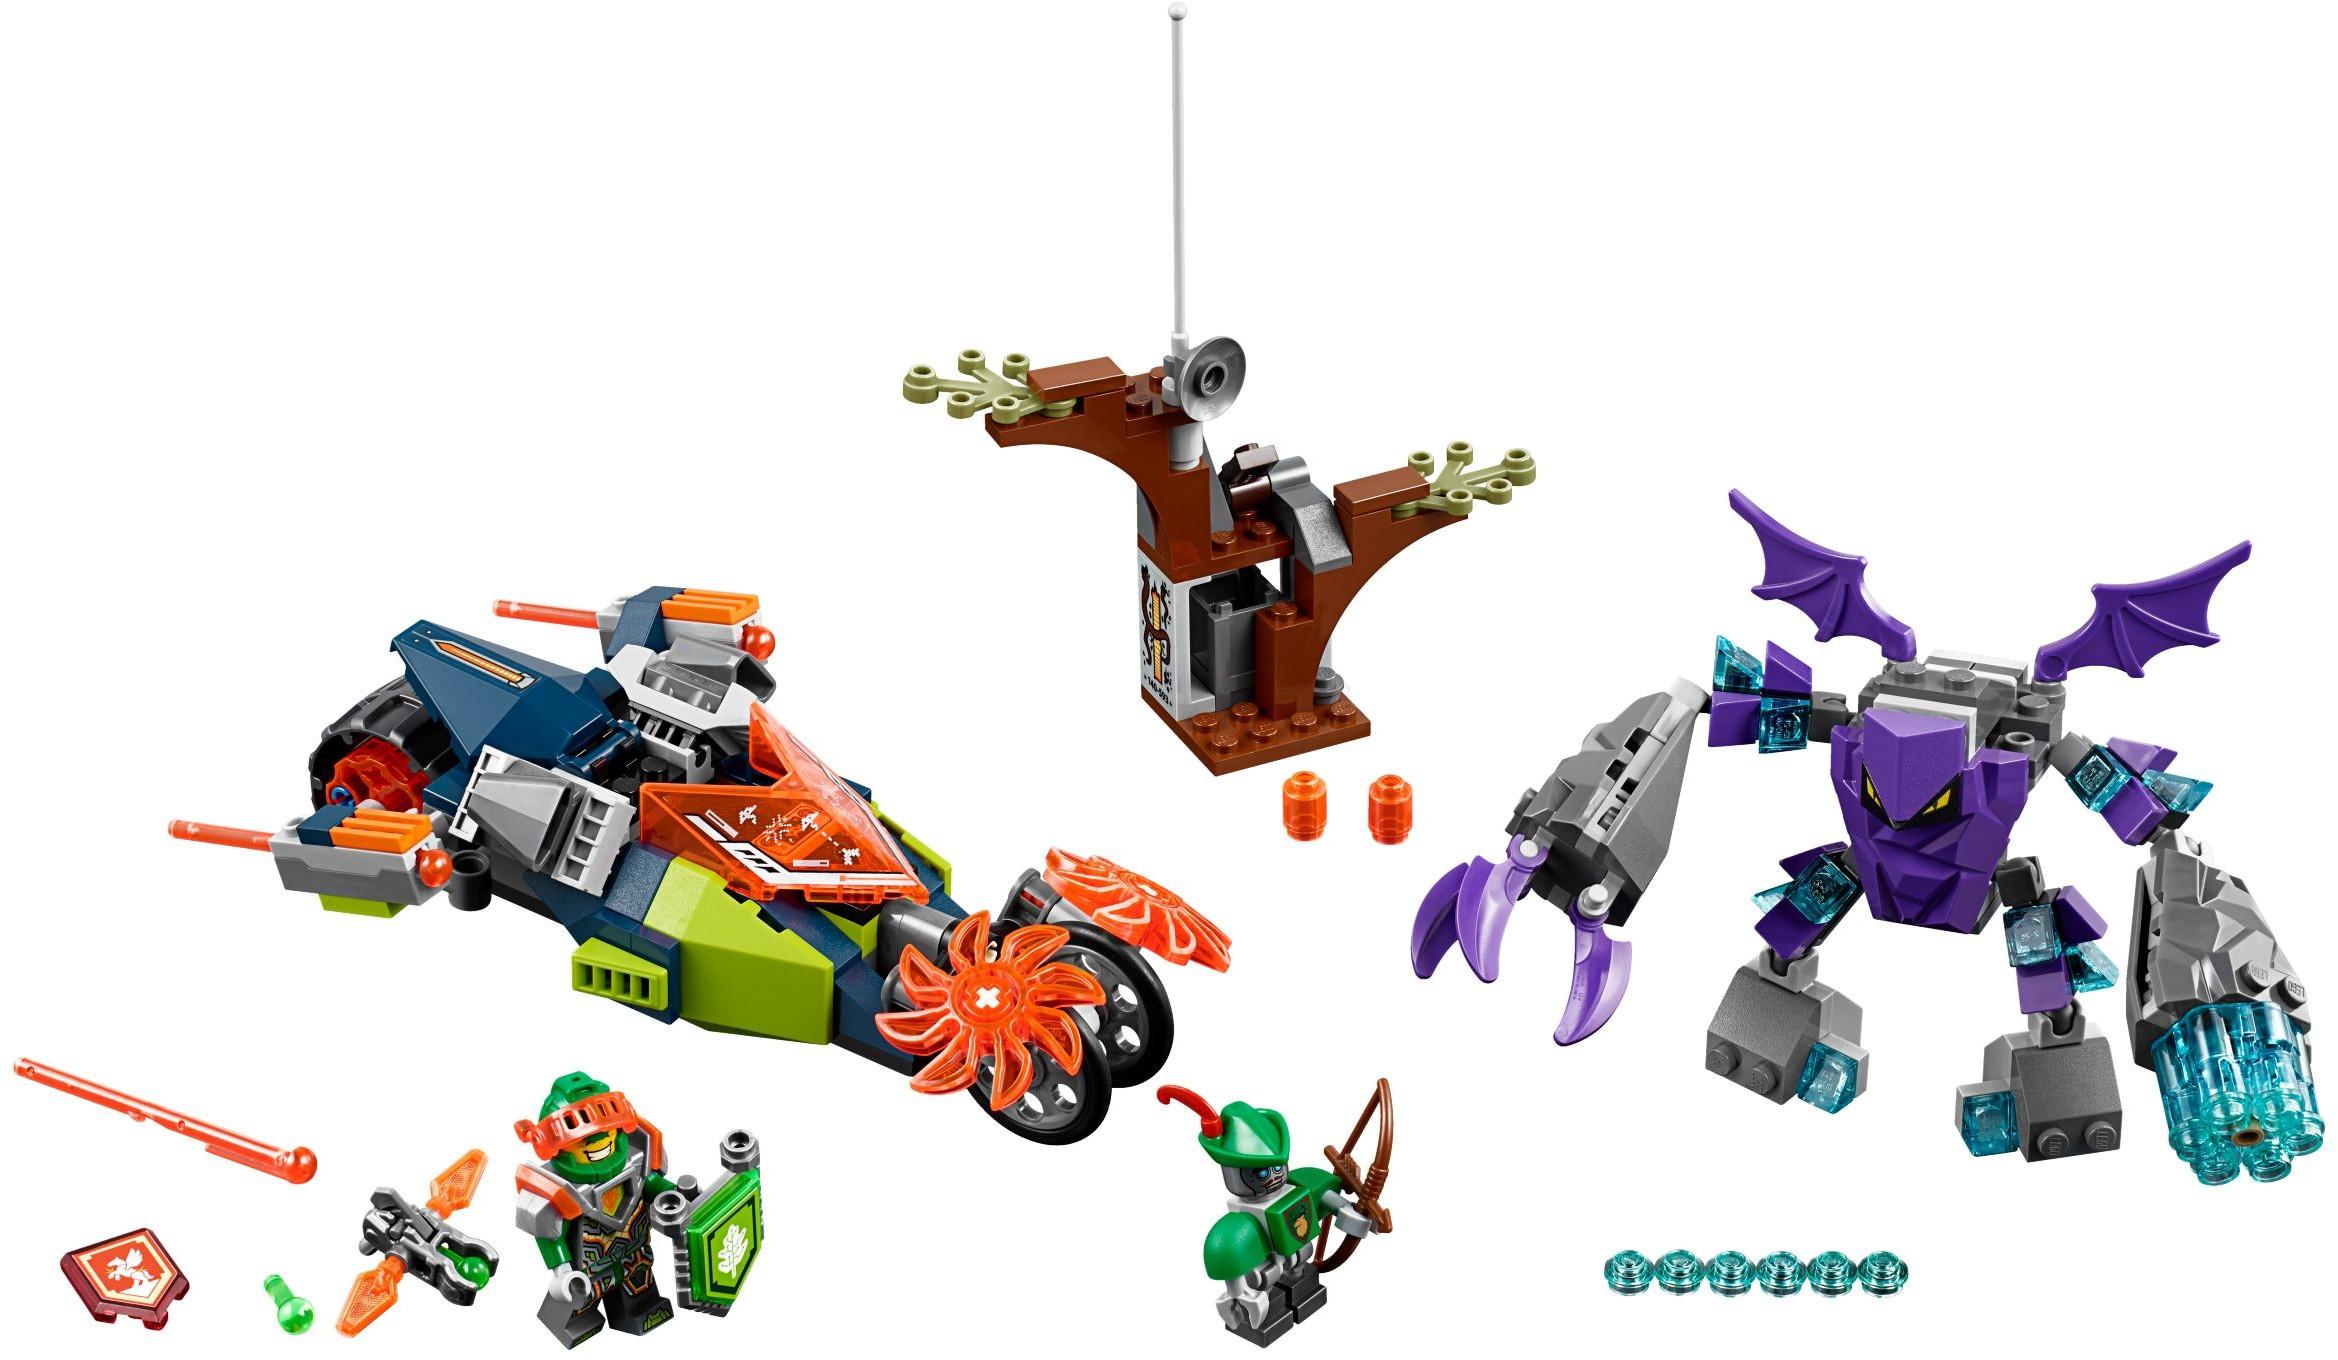 LEGO Nexo Knights Brickster Minifigure 70352 Mini Fig Brick Built Season 3